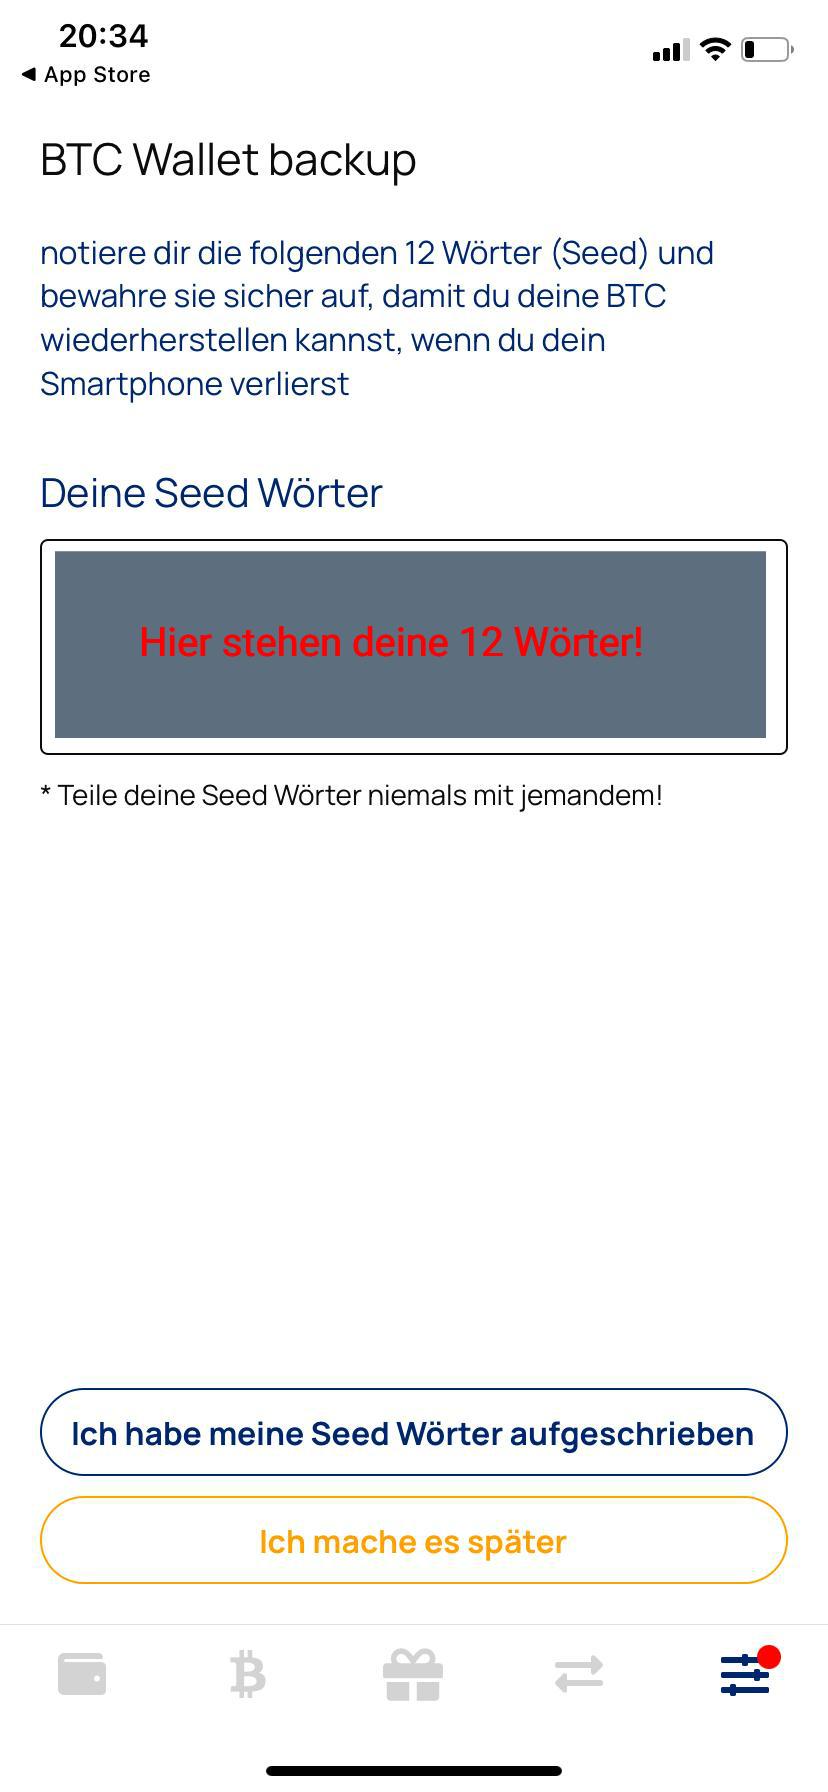 Relai BTC Wallet backup seed